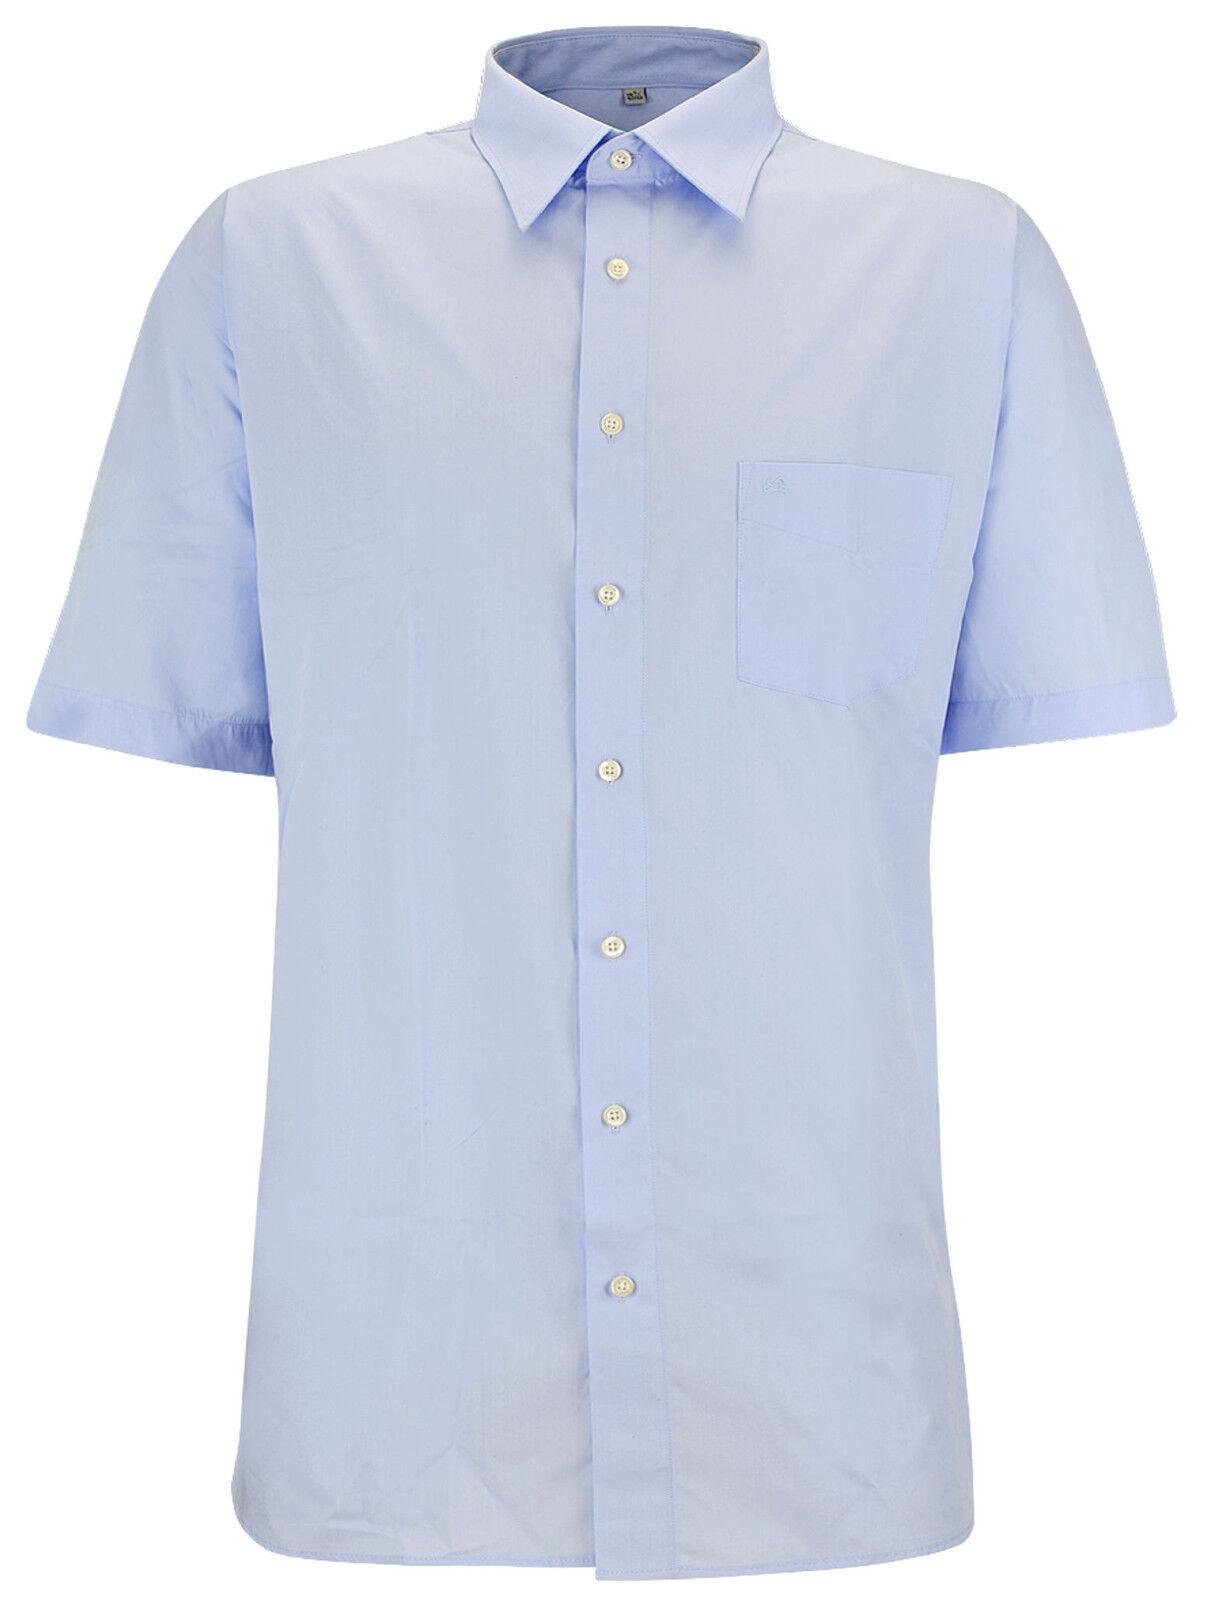 Online shop hemden sovrano SOVRANO Hemd